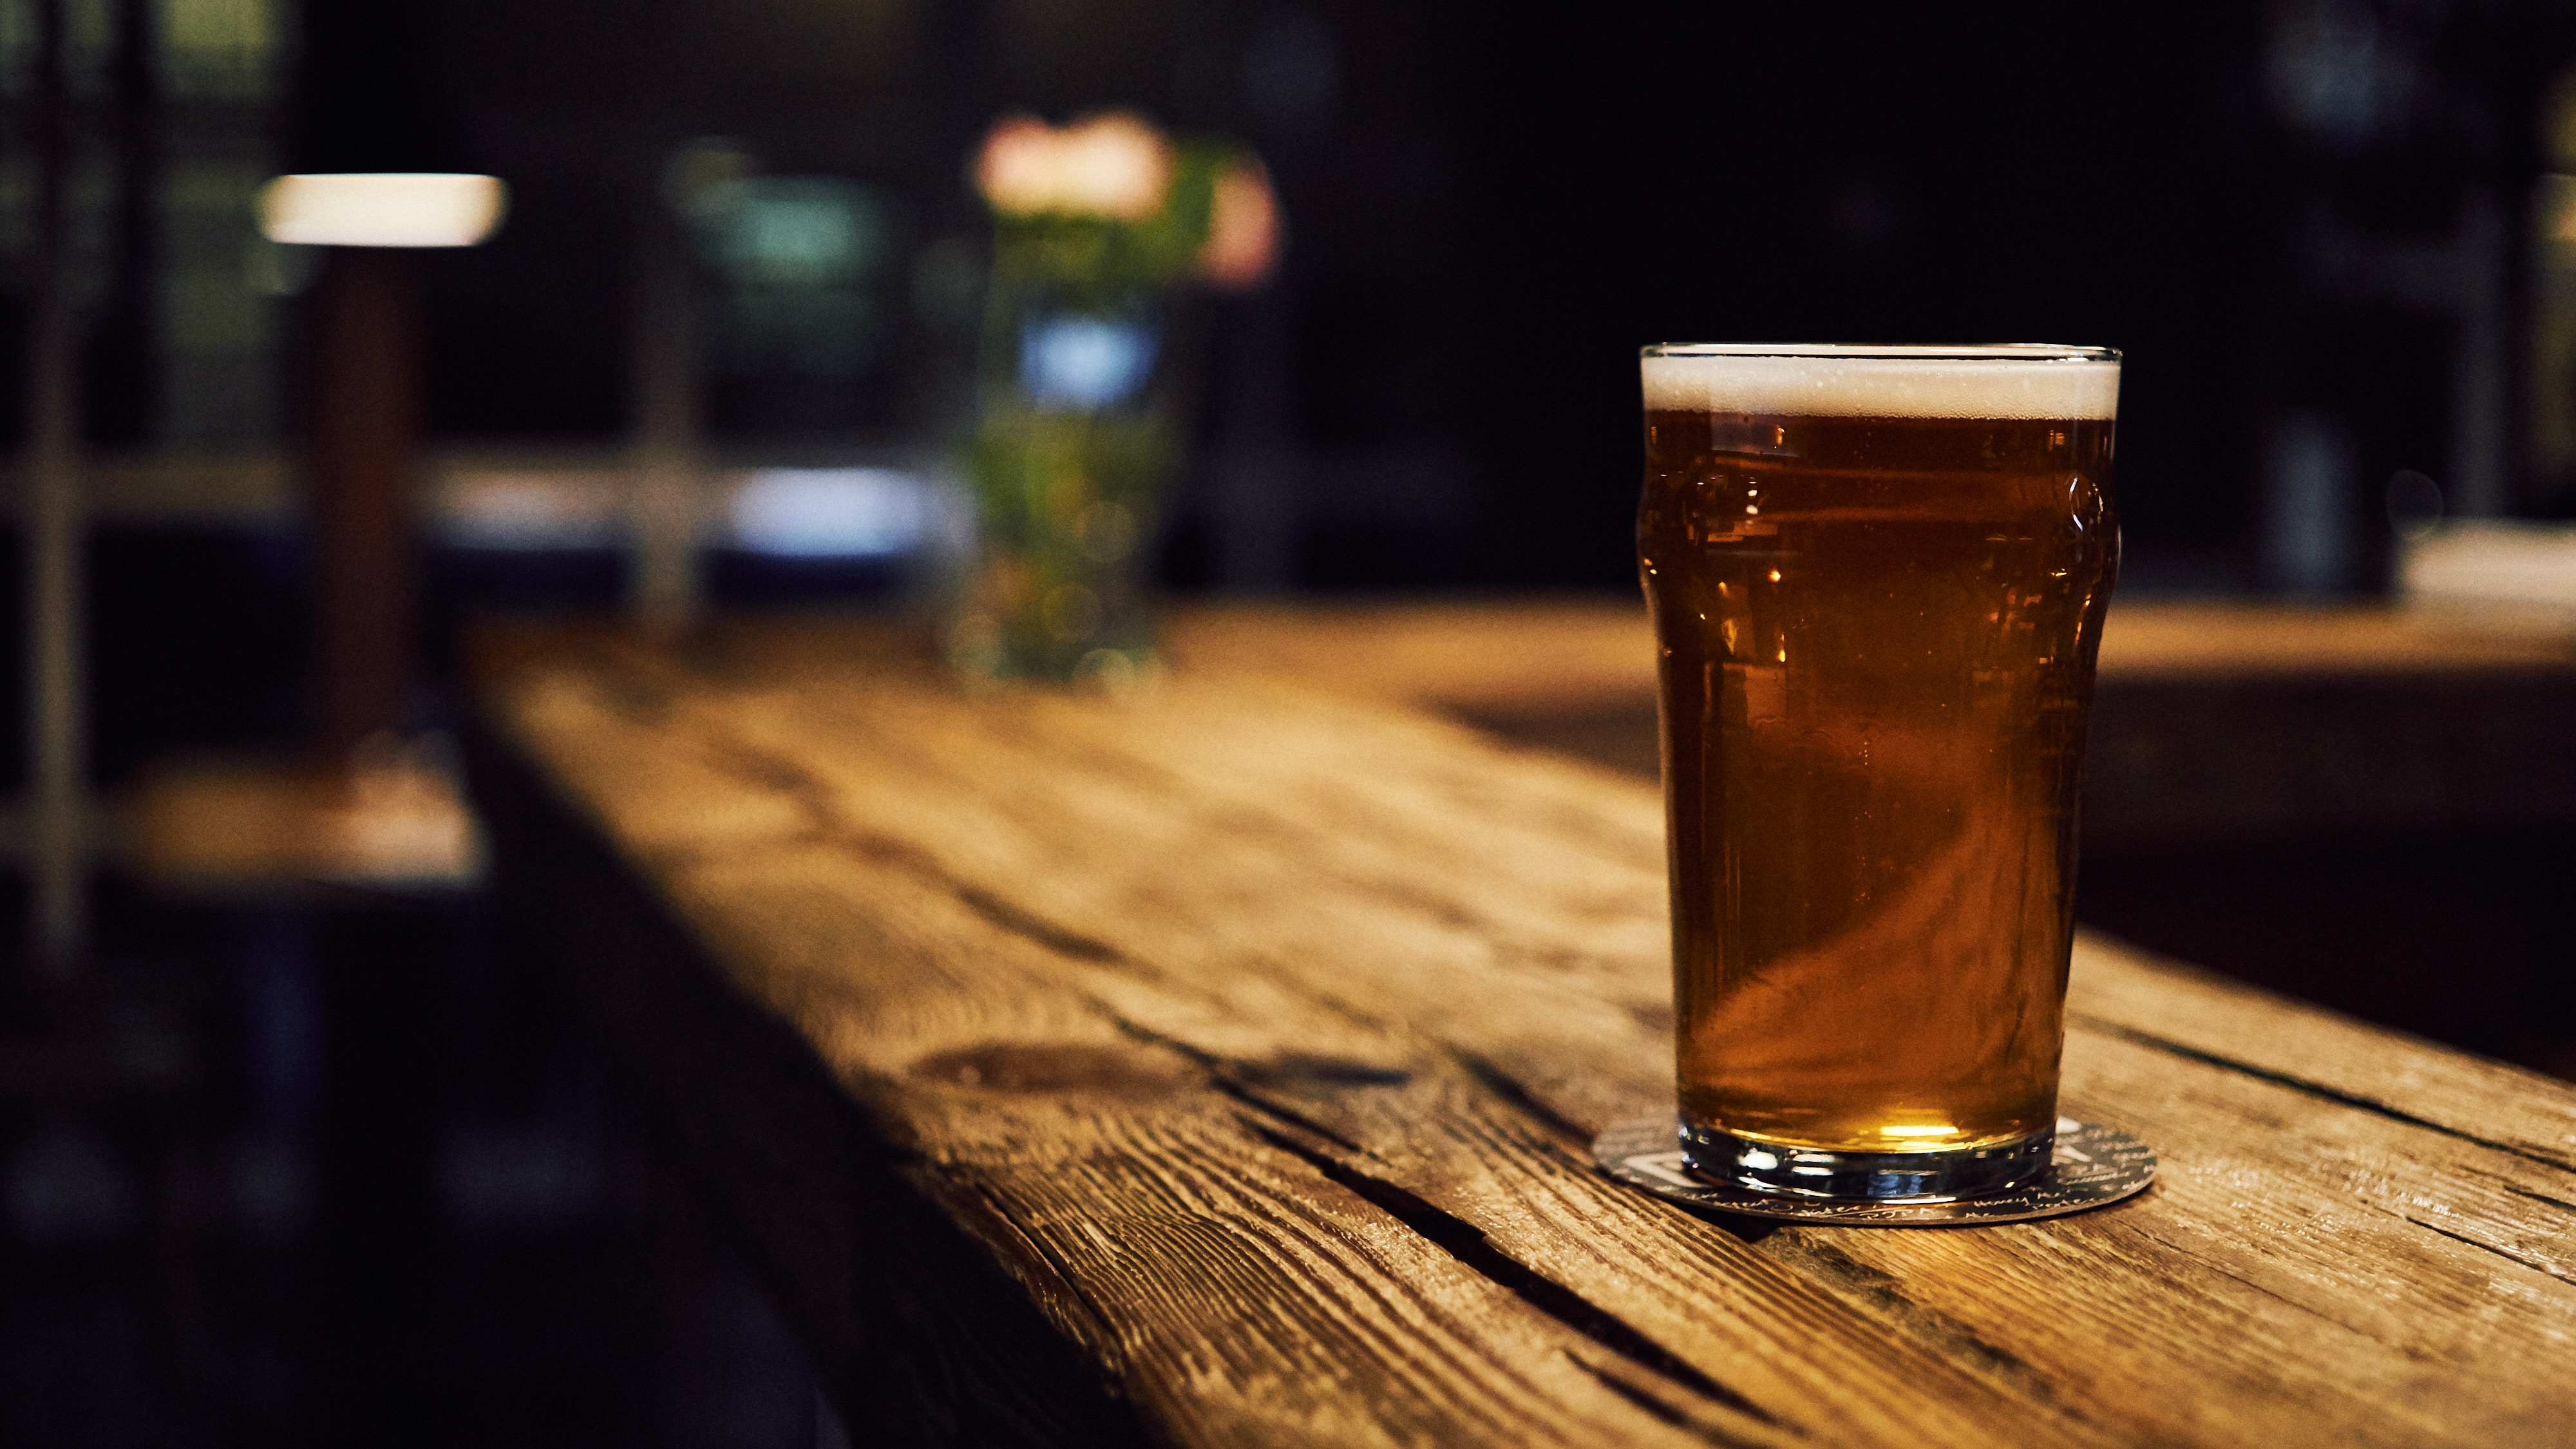 Beneficios de tomar cerveza